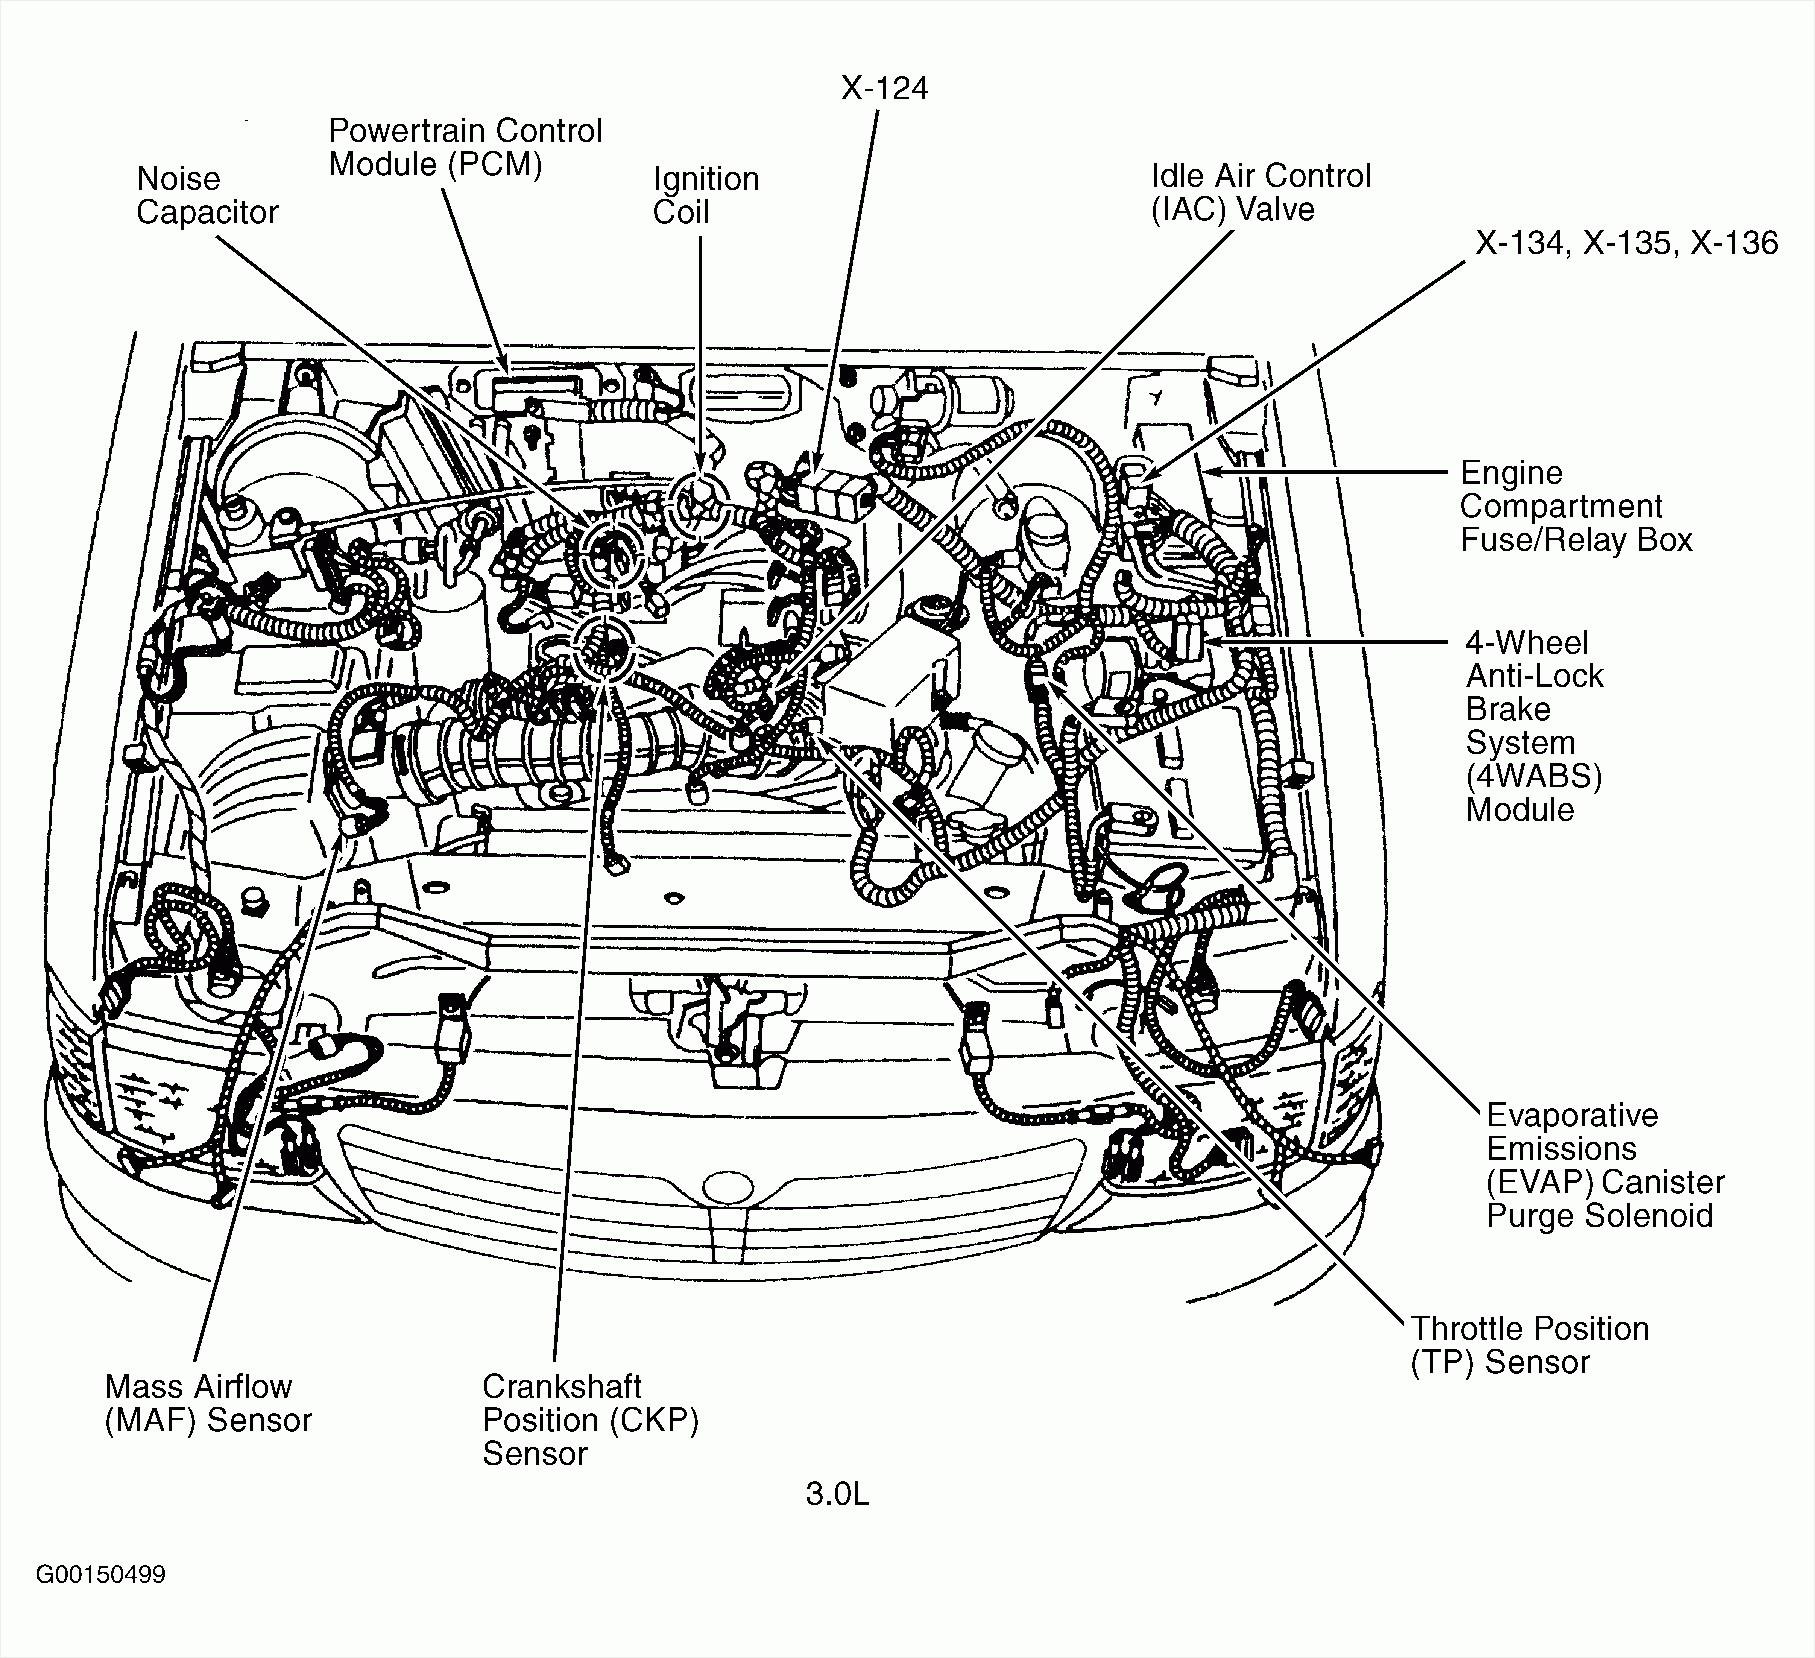 96 Grand Prix Engine Diagram - Wiring Diagram filter arch-magazine -  arch-magazine.romagranata.it | Grand Prix 2006 5 3 Engine Diagram |  | Roma Granata